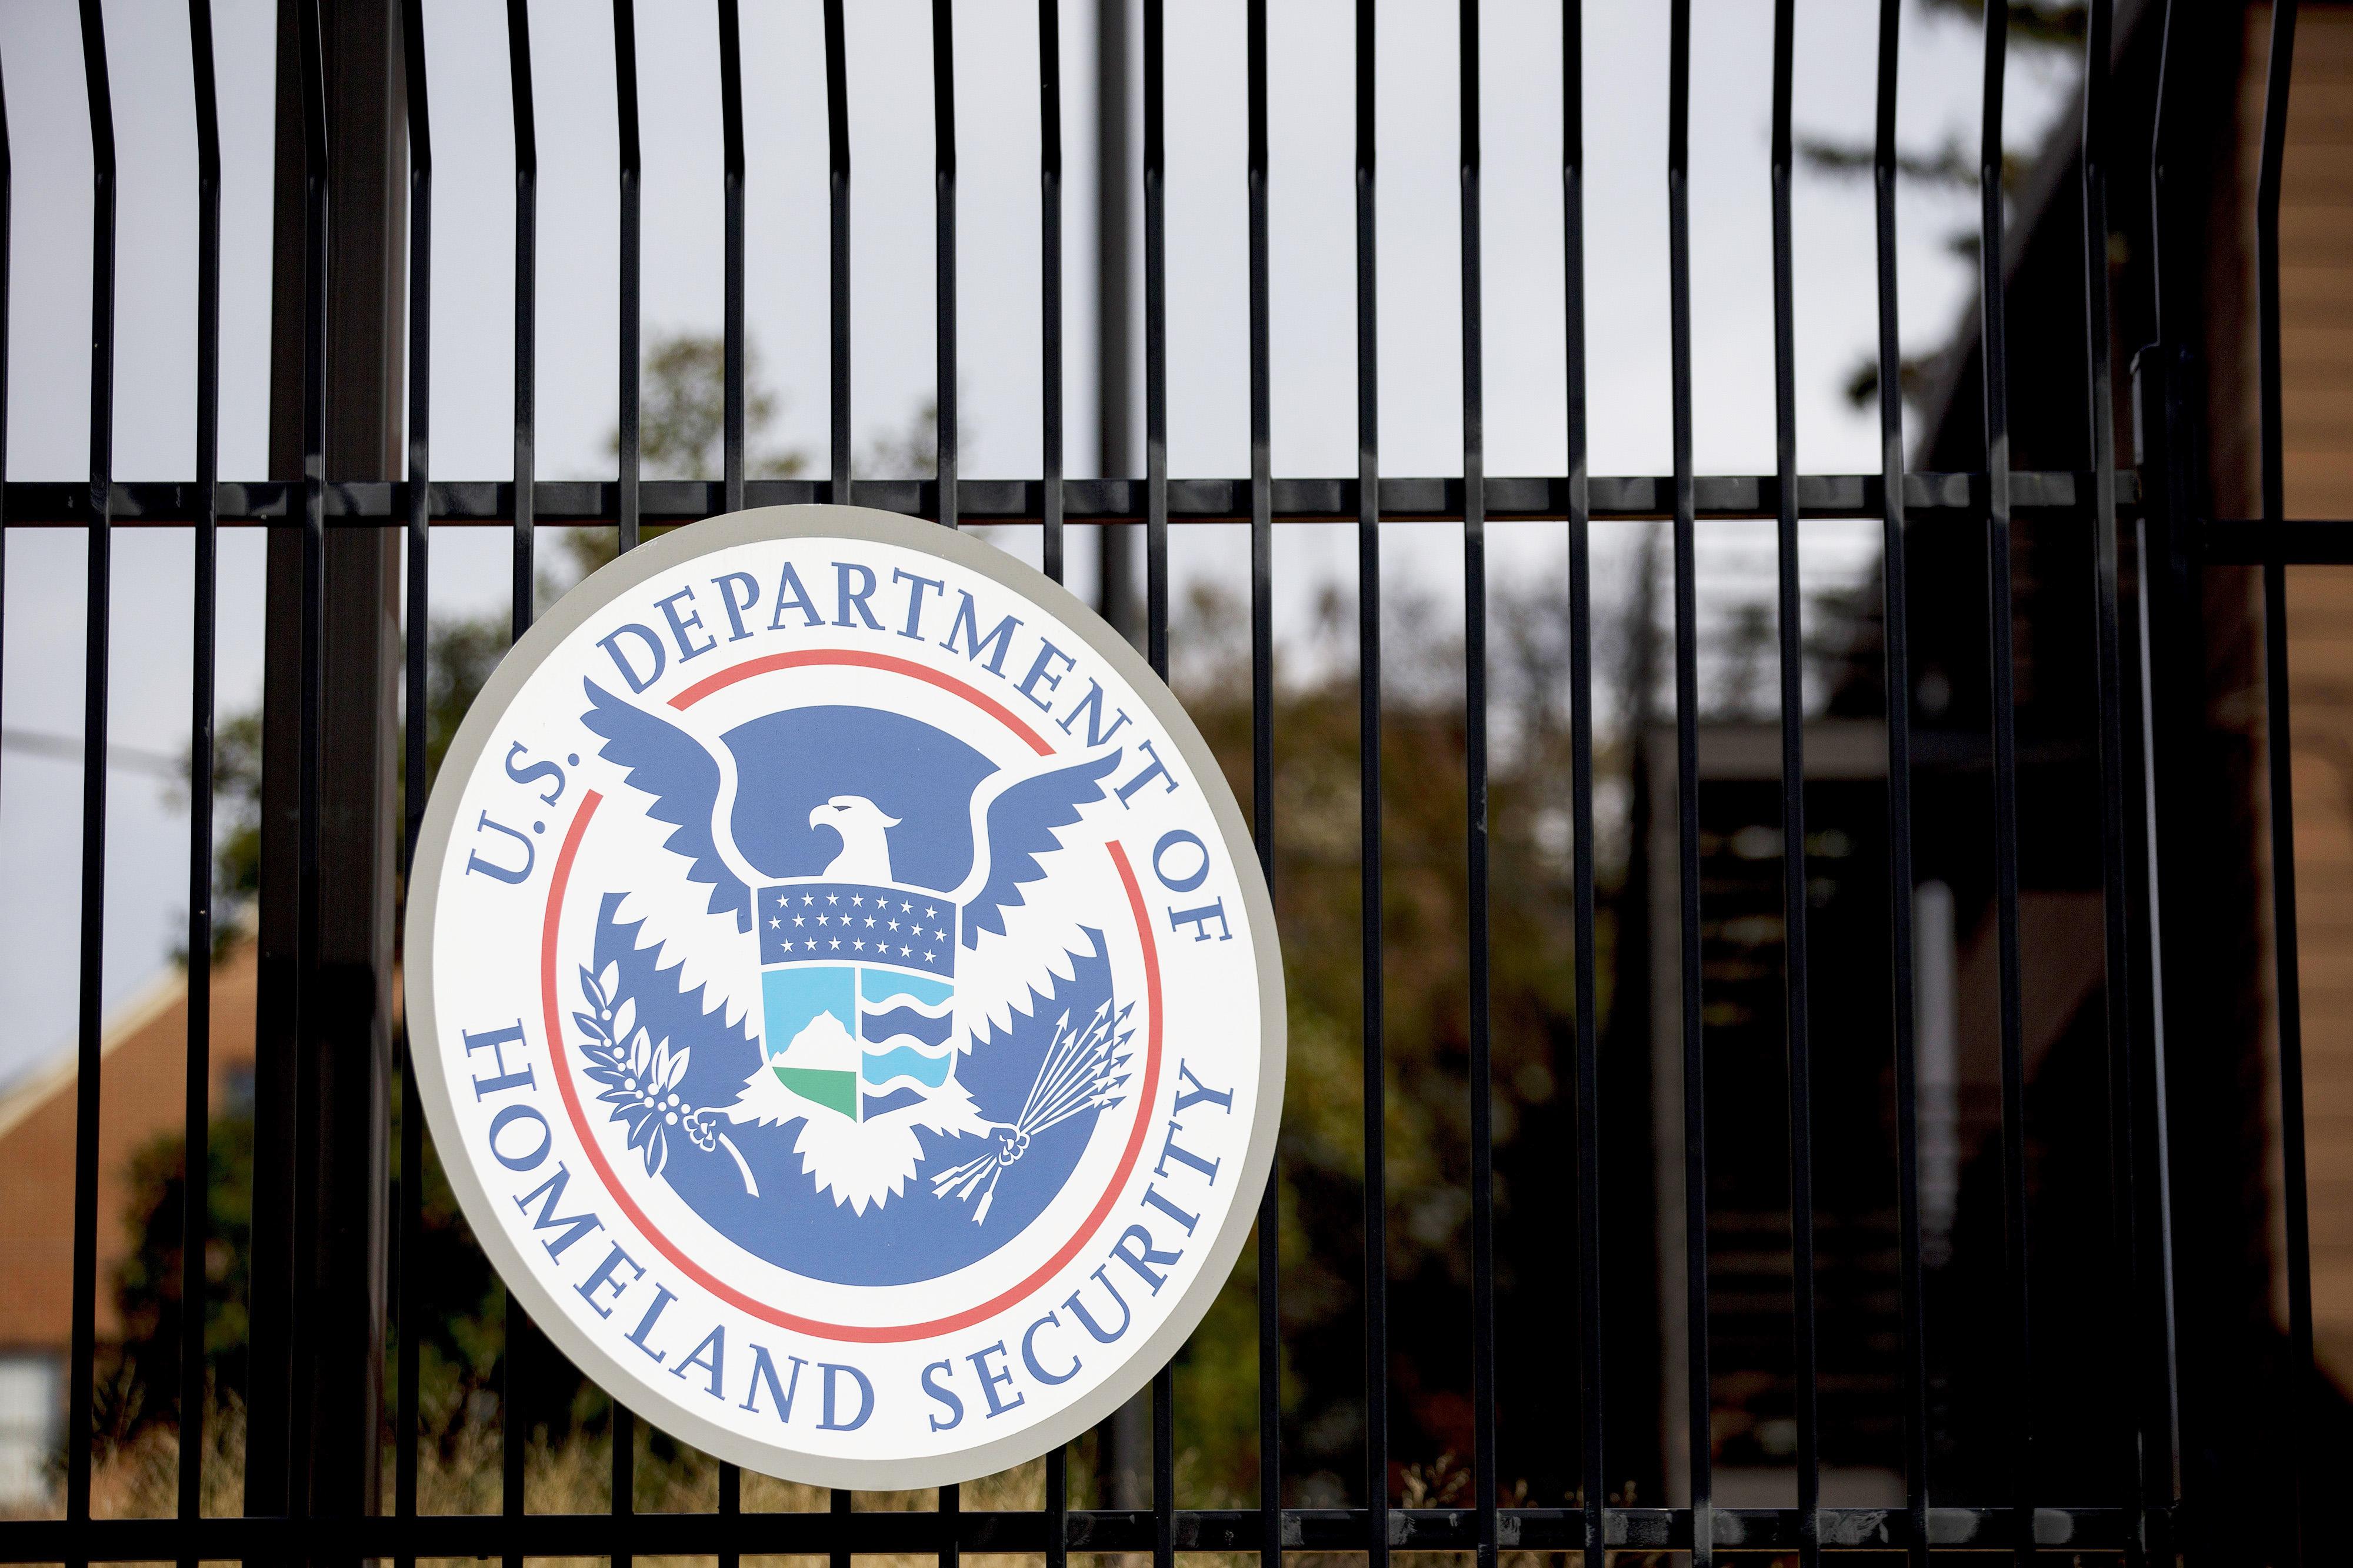 U.S Department of Homeland Security